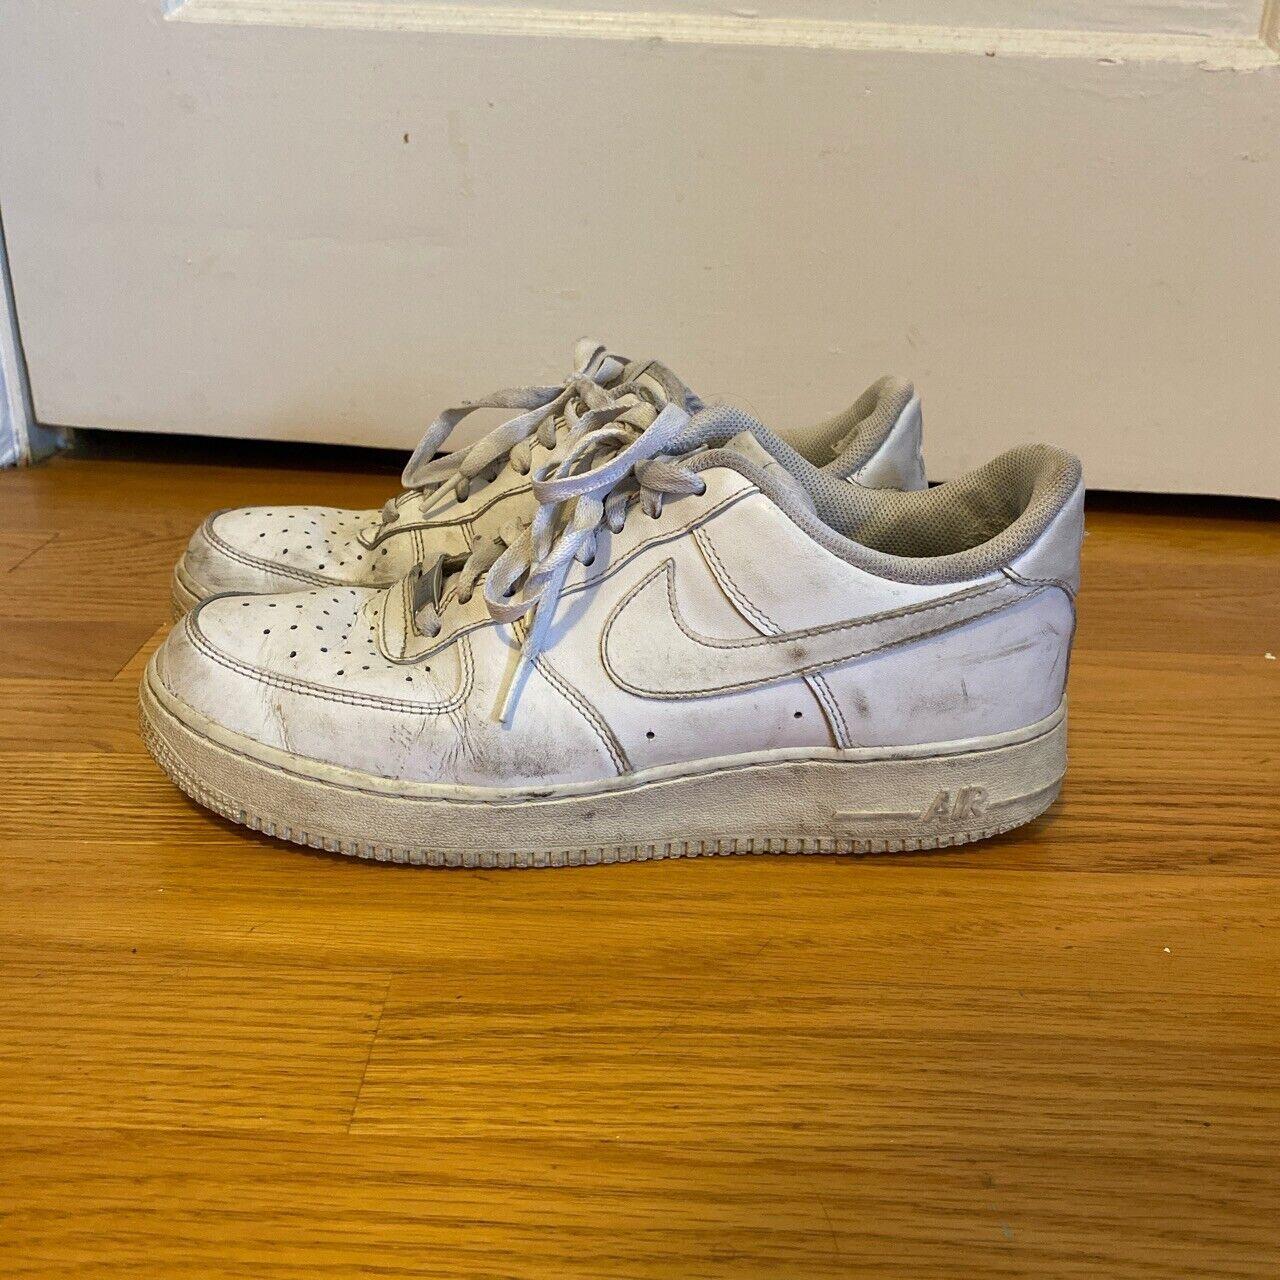 Nike Air Force 1 '07 White - image 1